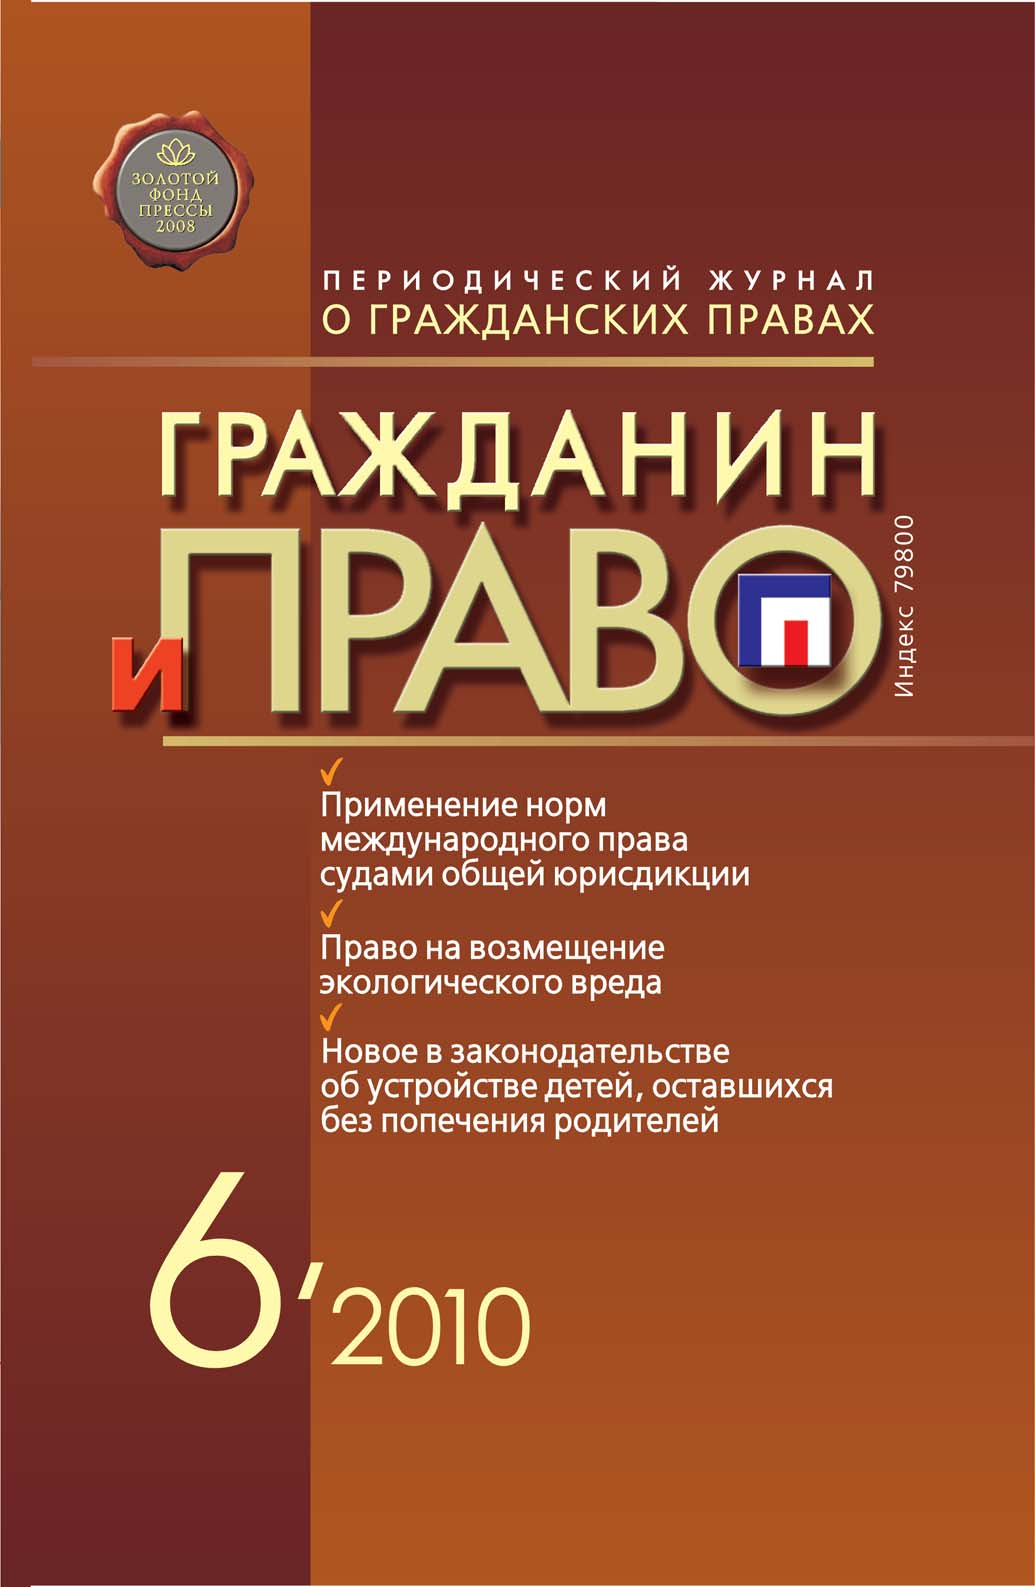 Гражданин и право №06/2010